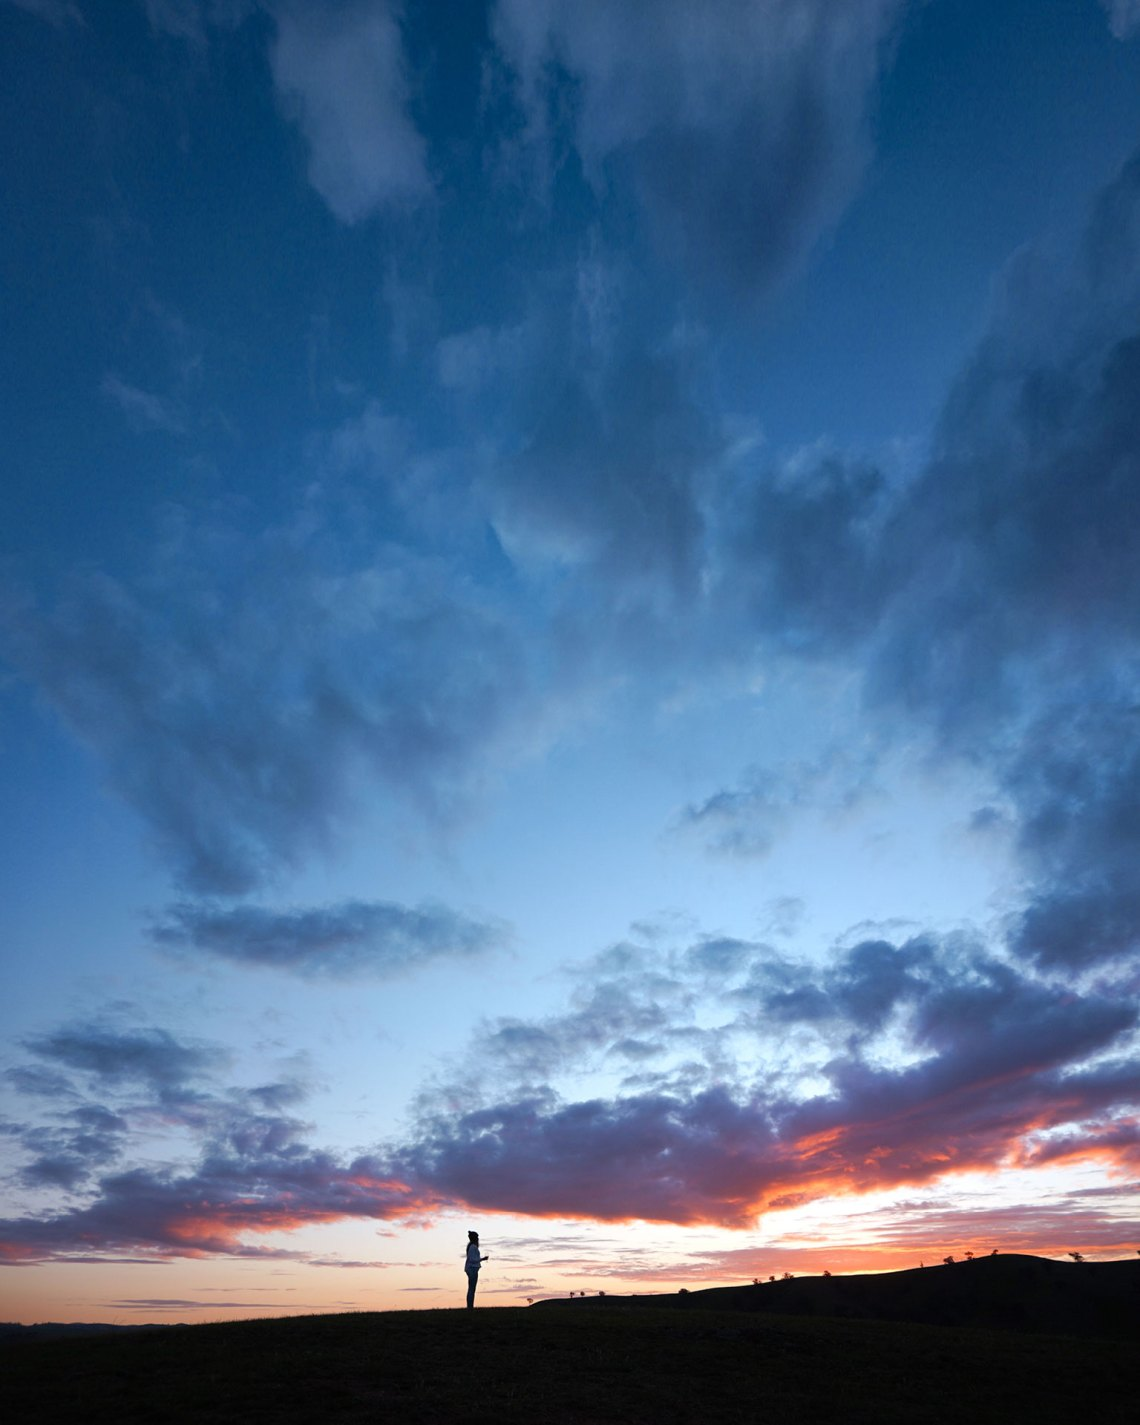 Kaede Standing On Hill For Sunset